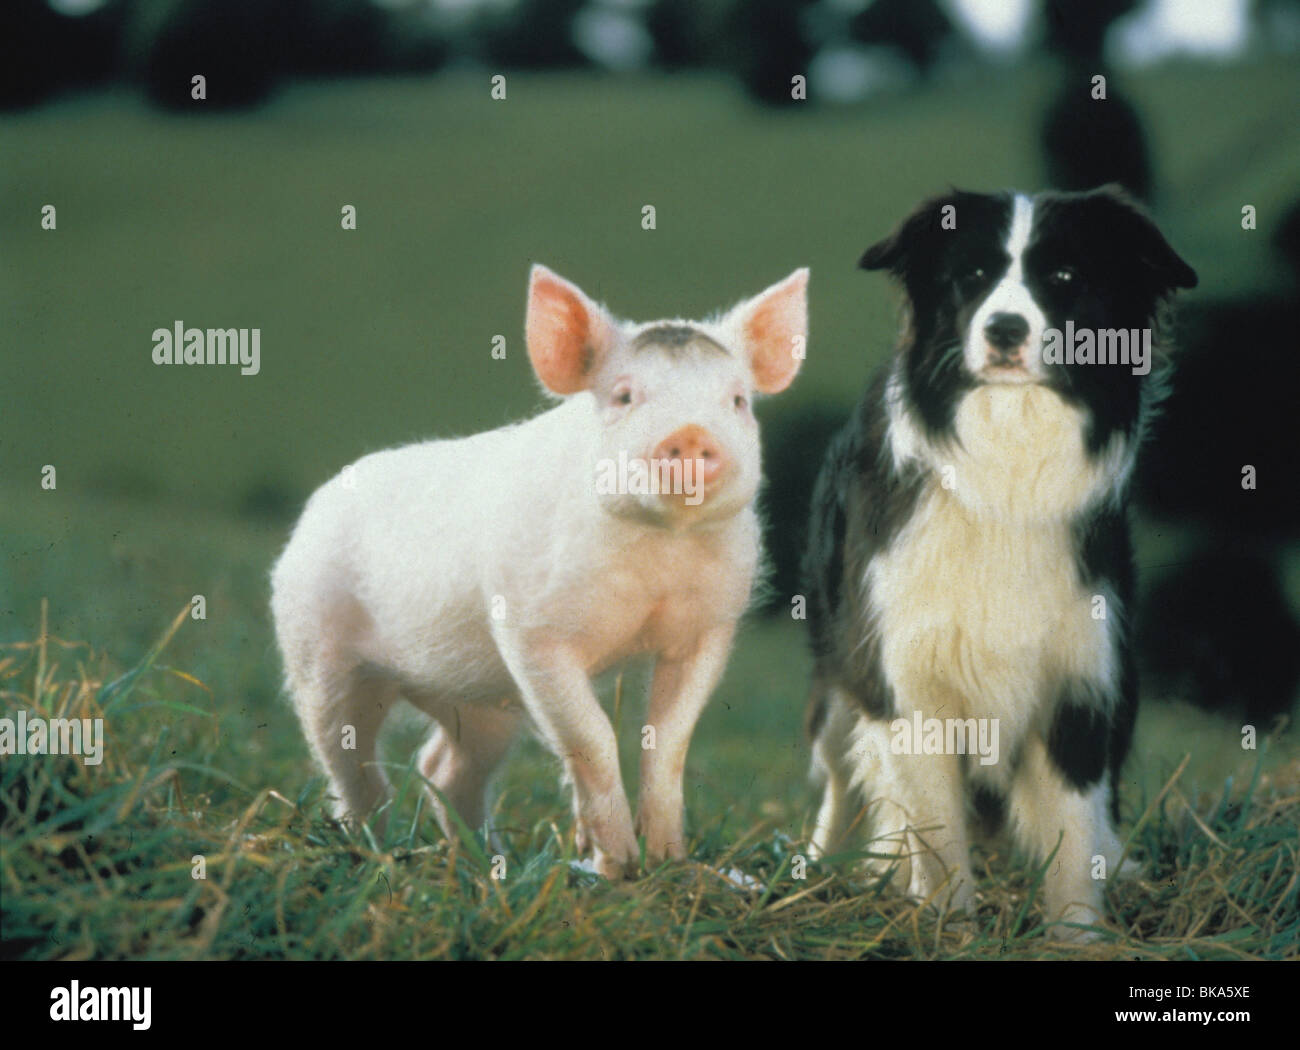 BABE -1995 Stock Photo